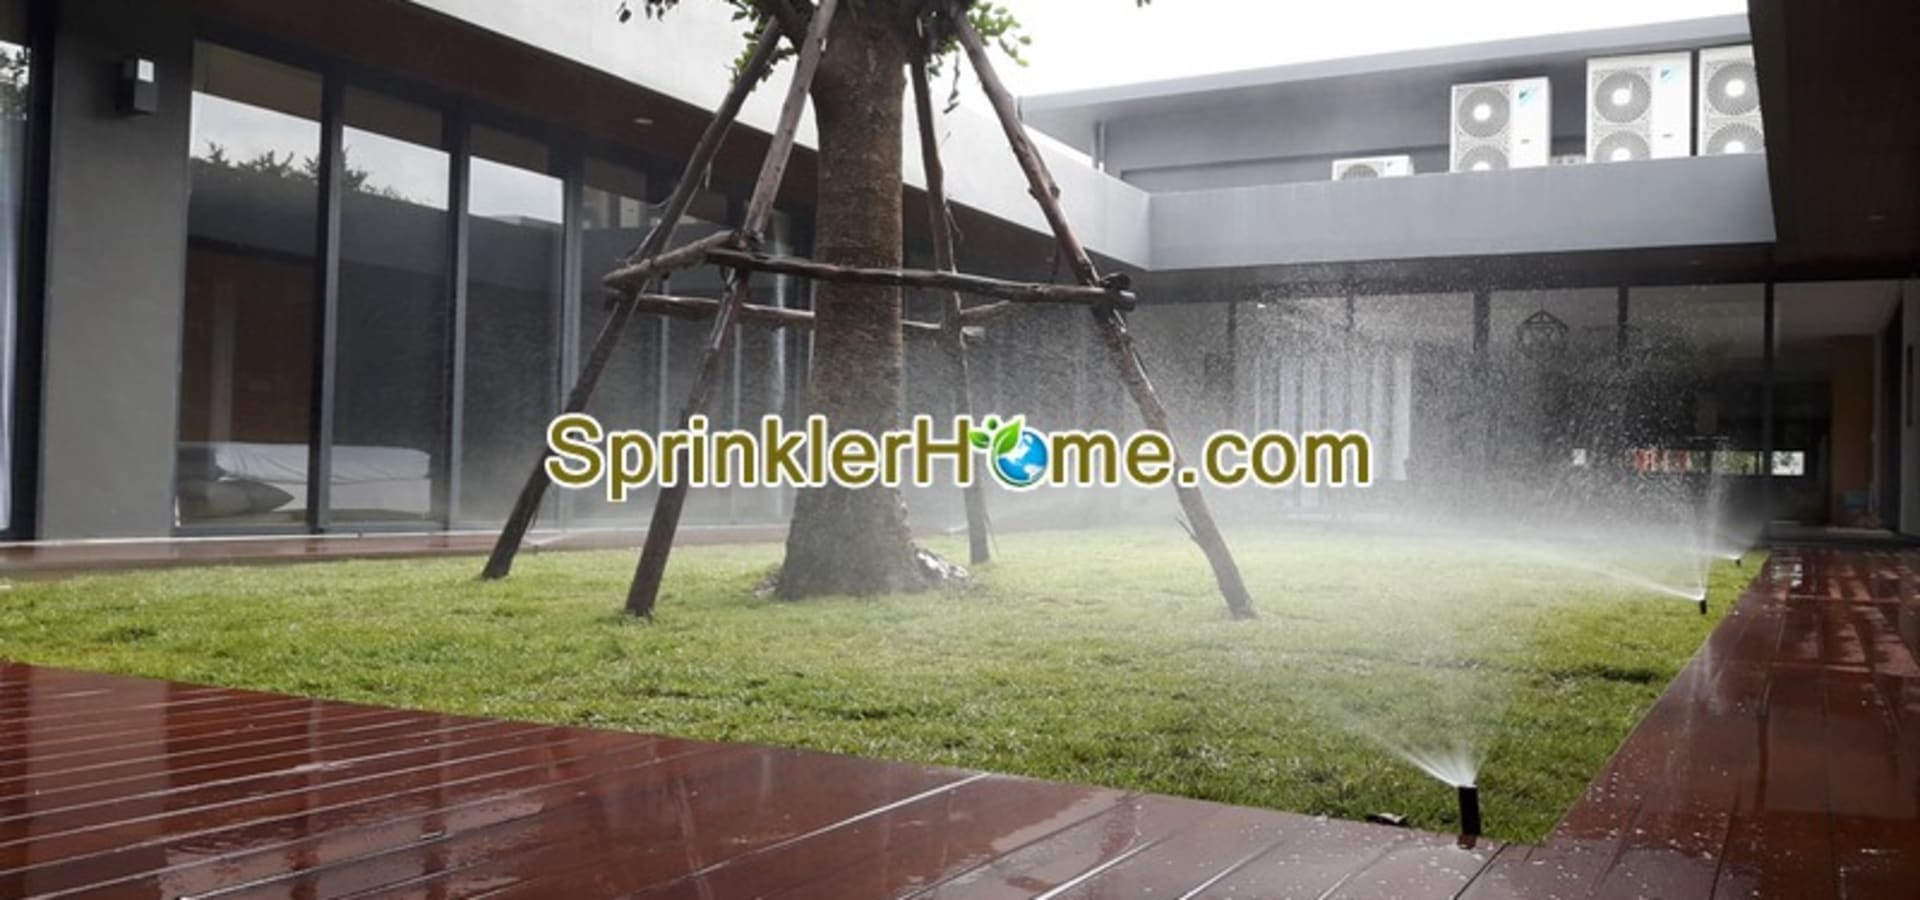 SprinklerHome.com